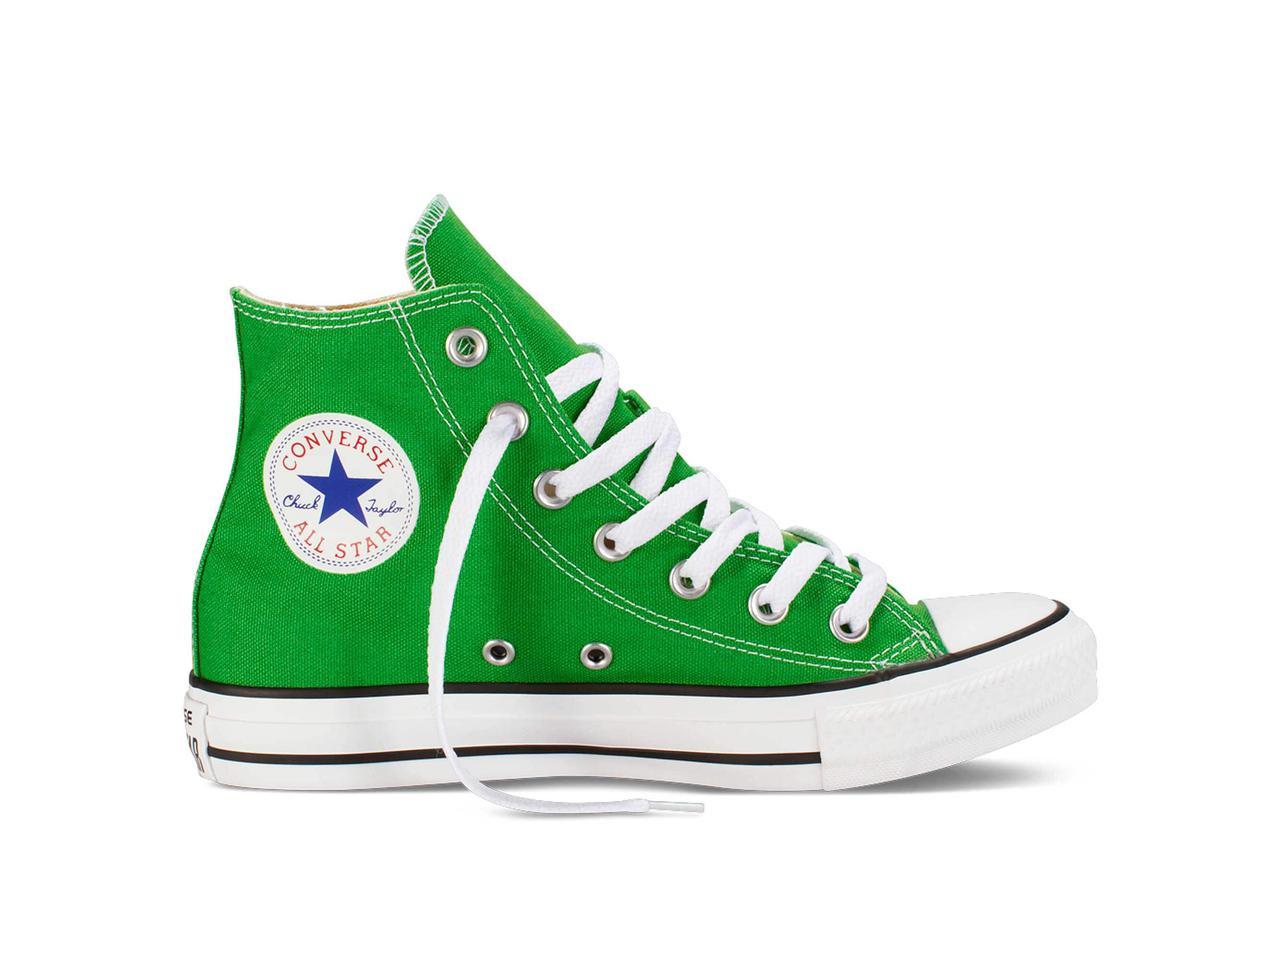 Кеды Converse All Star High Green в зеленом цвете